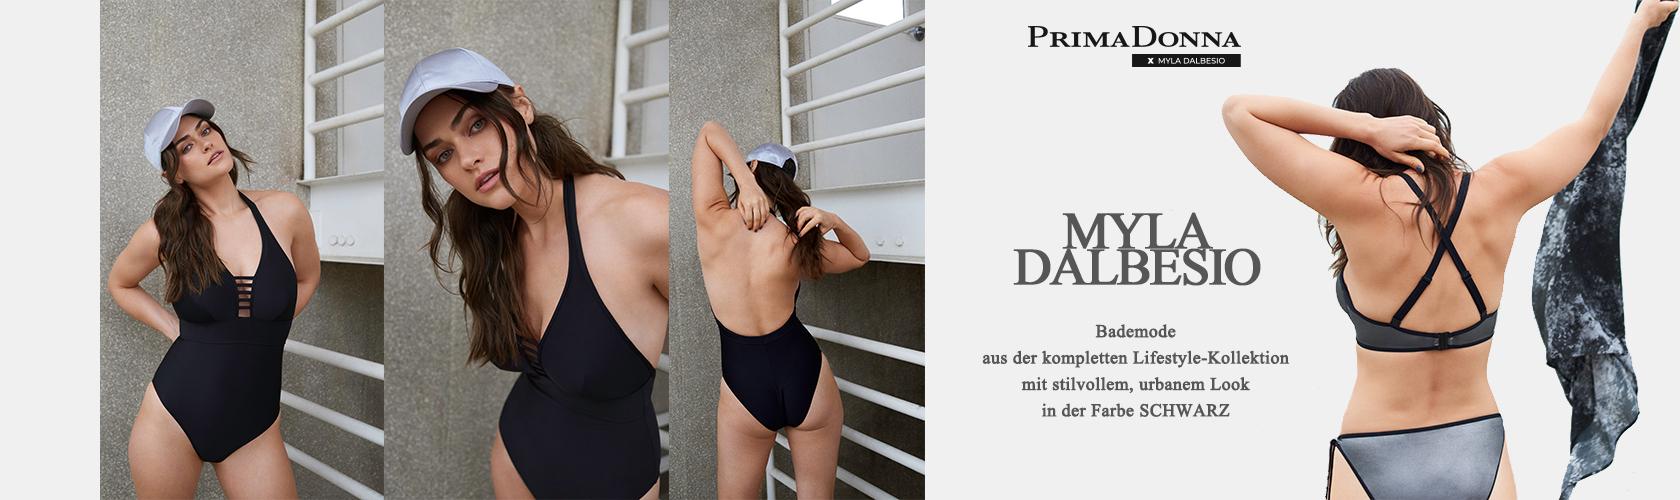 Slideshow MYLA DALBESIO swim 19.07.